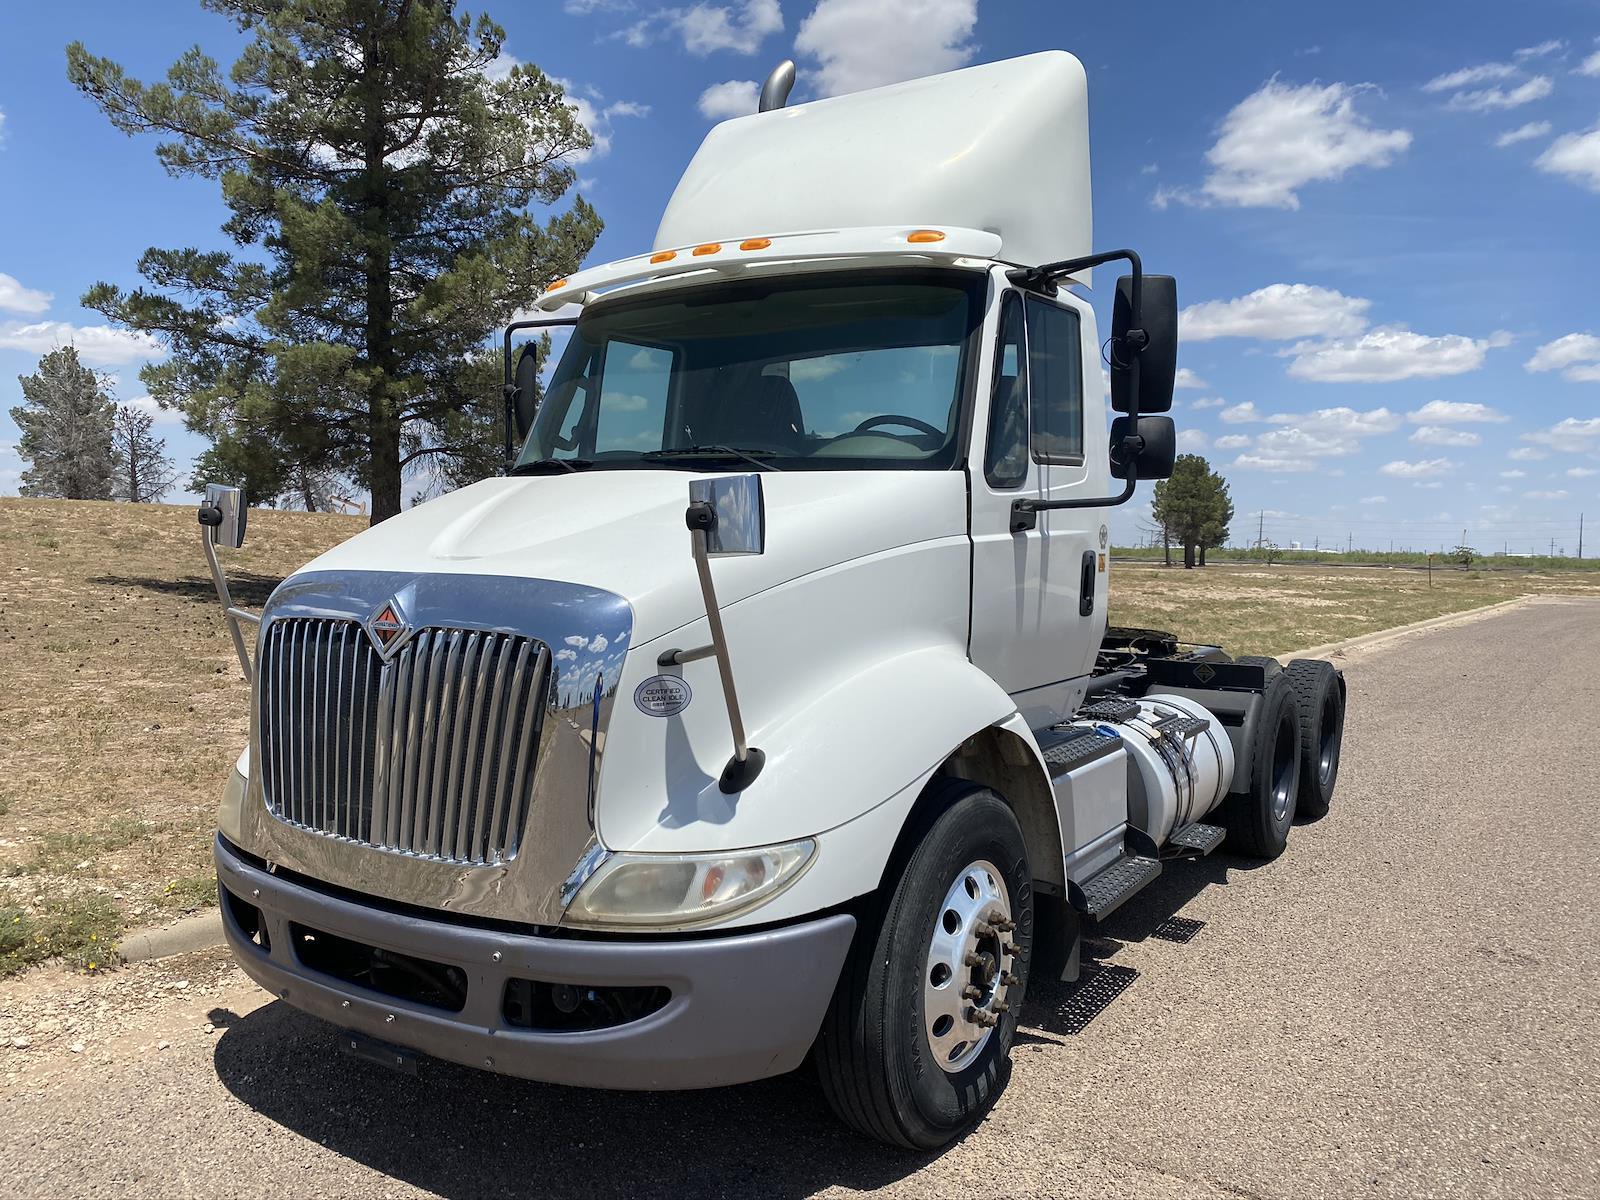 2015 International Truck 6x4, Tractor #801L715510 - photo 1